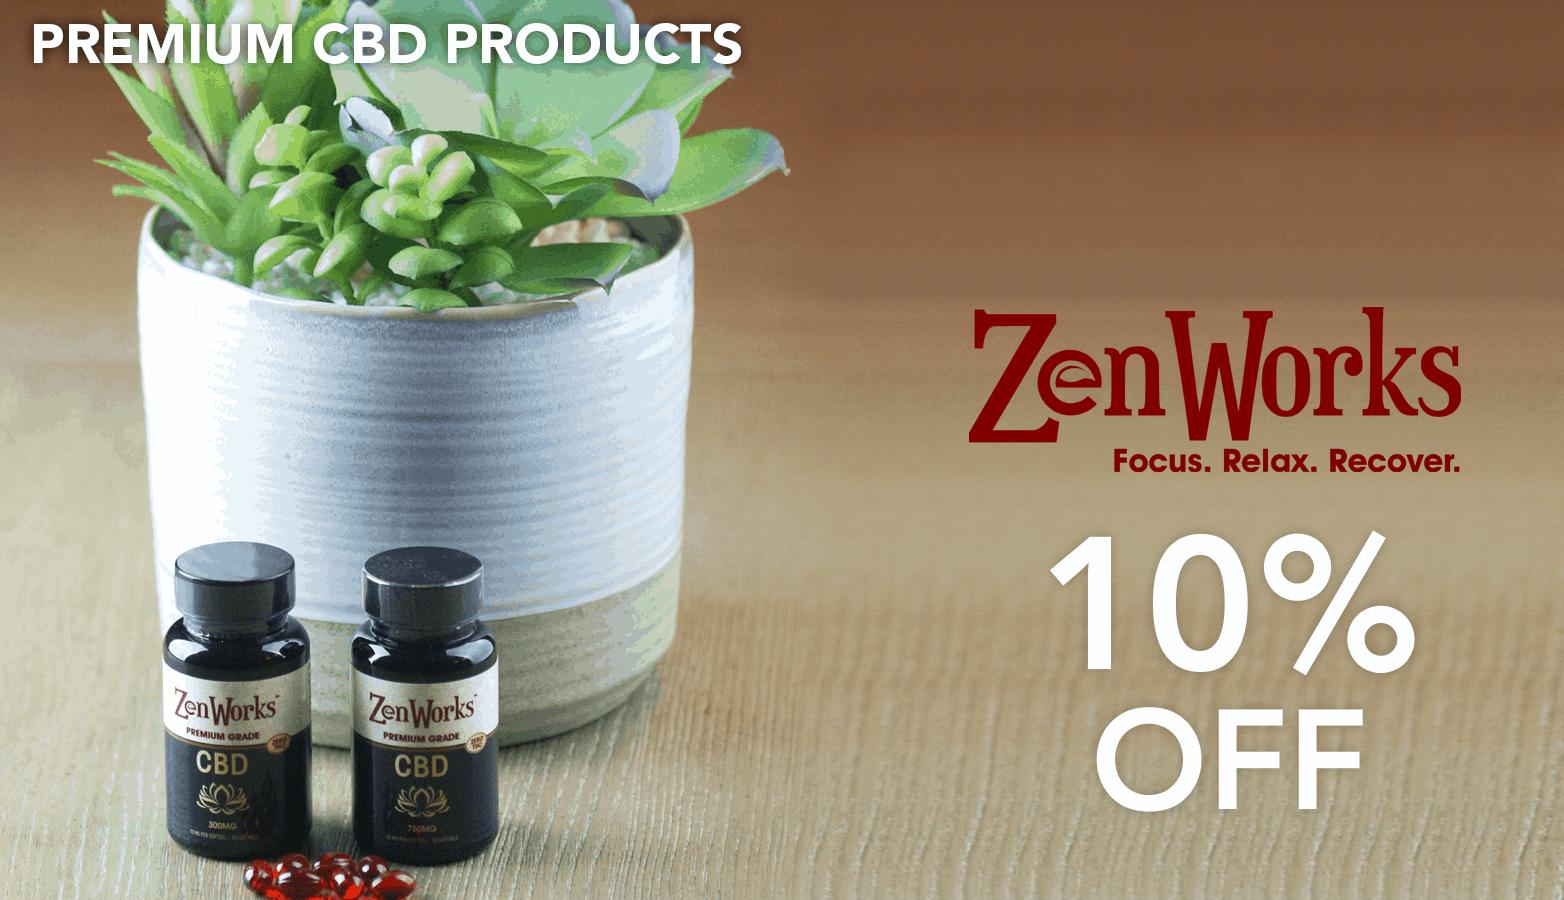 ZenWorks CBD Coupon Code discounts promos save on cannabis online Website